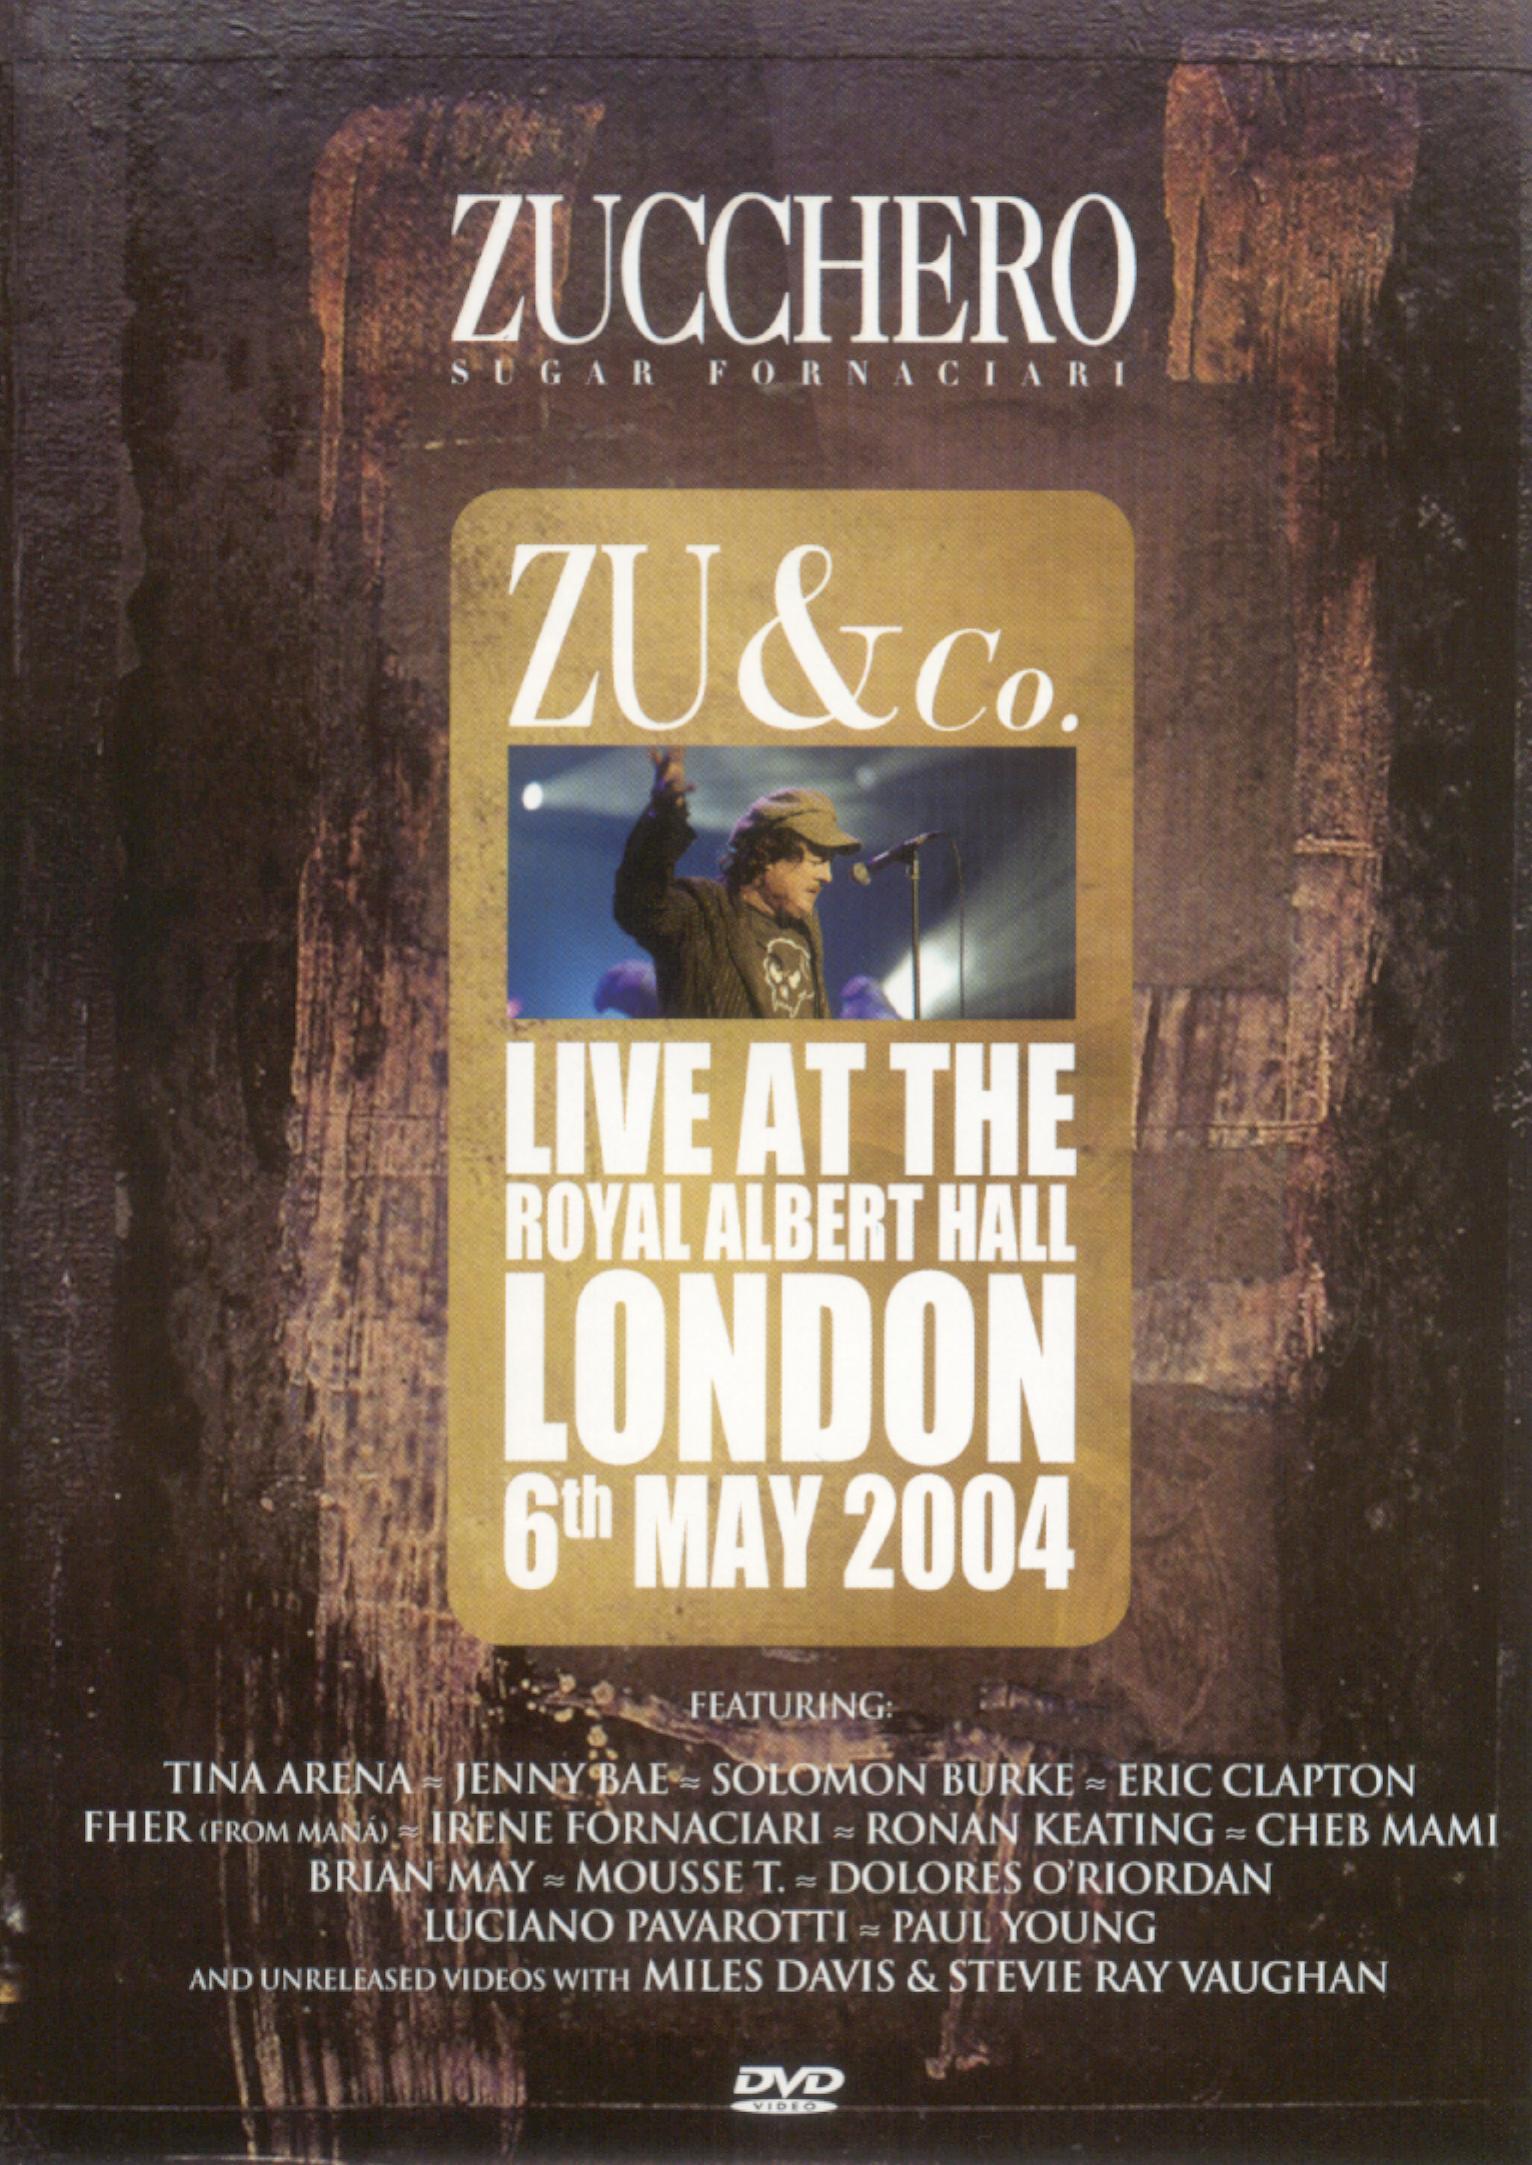 Zucchero: Zu and Co - Live at Royal Albert Hall